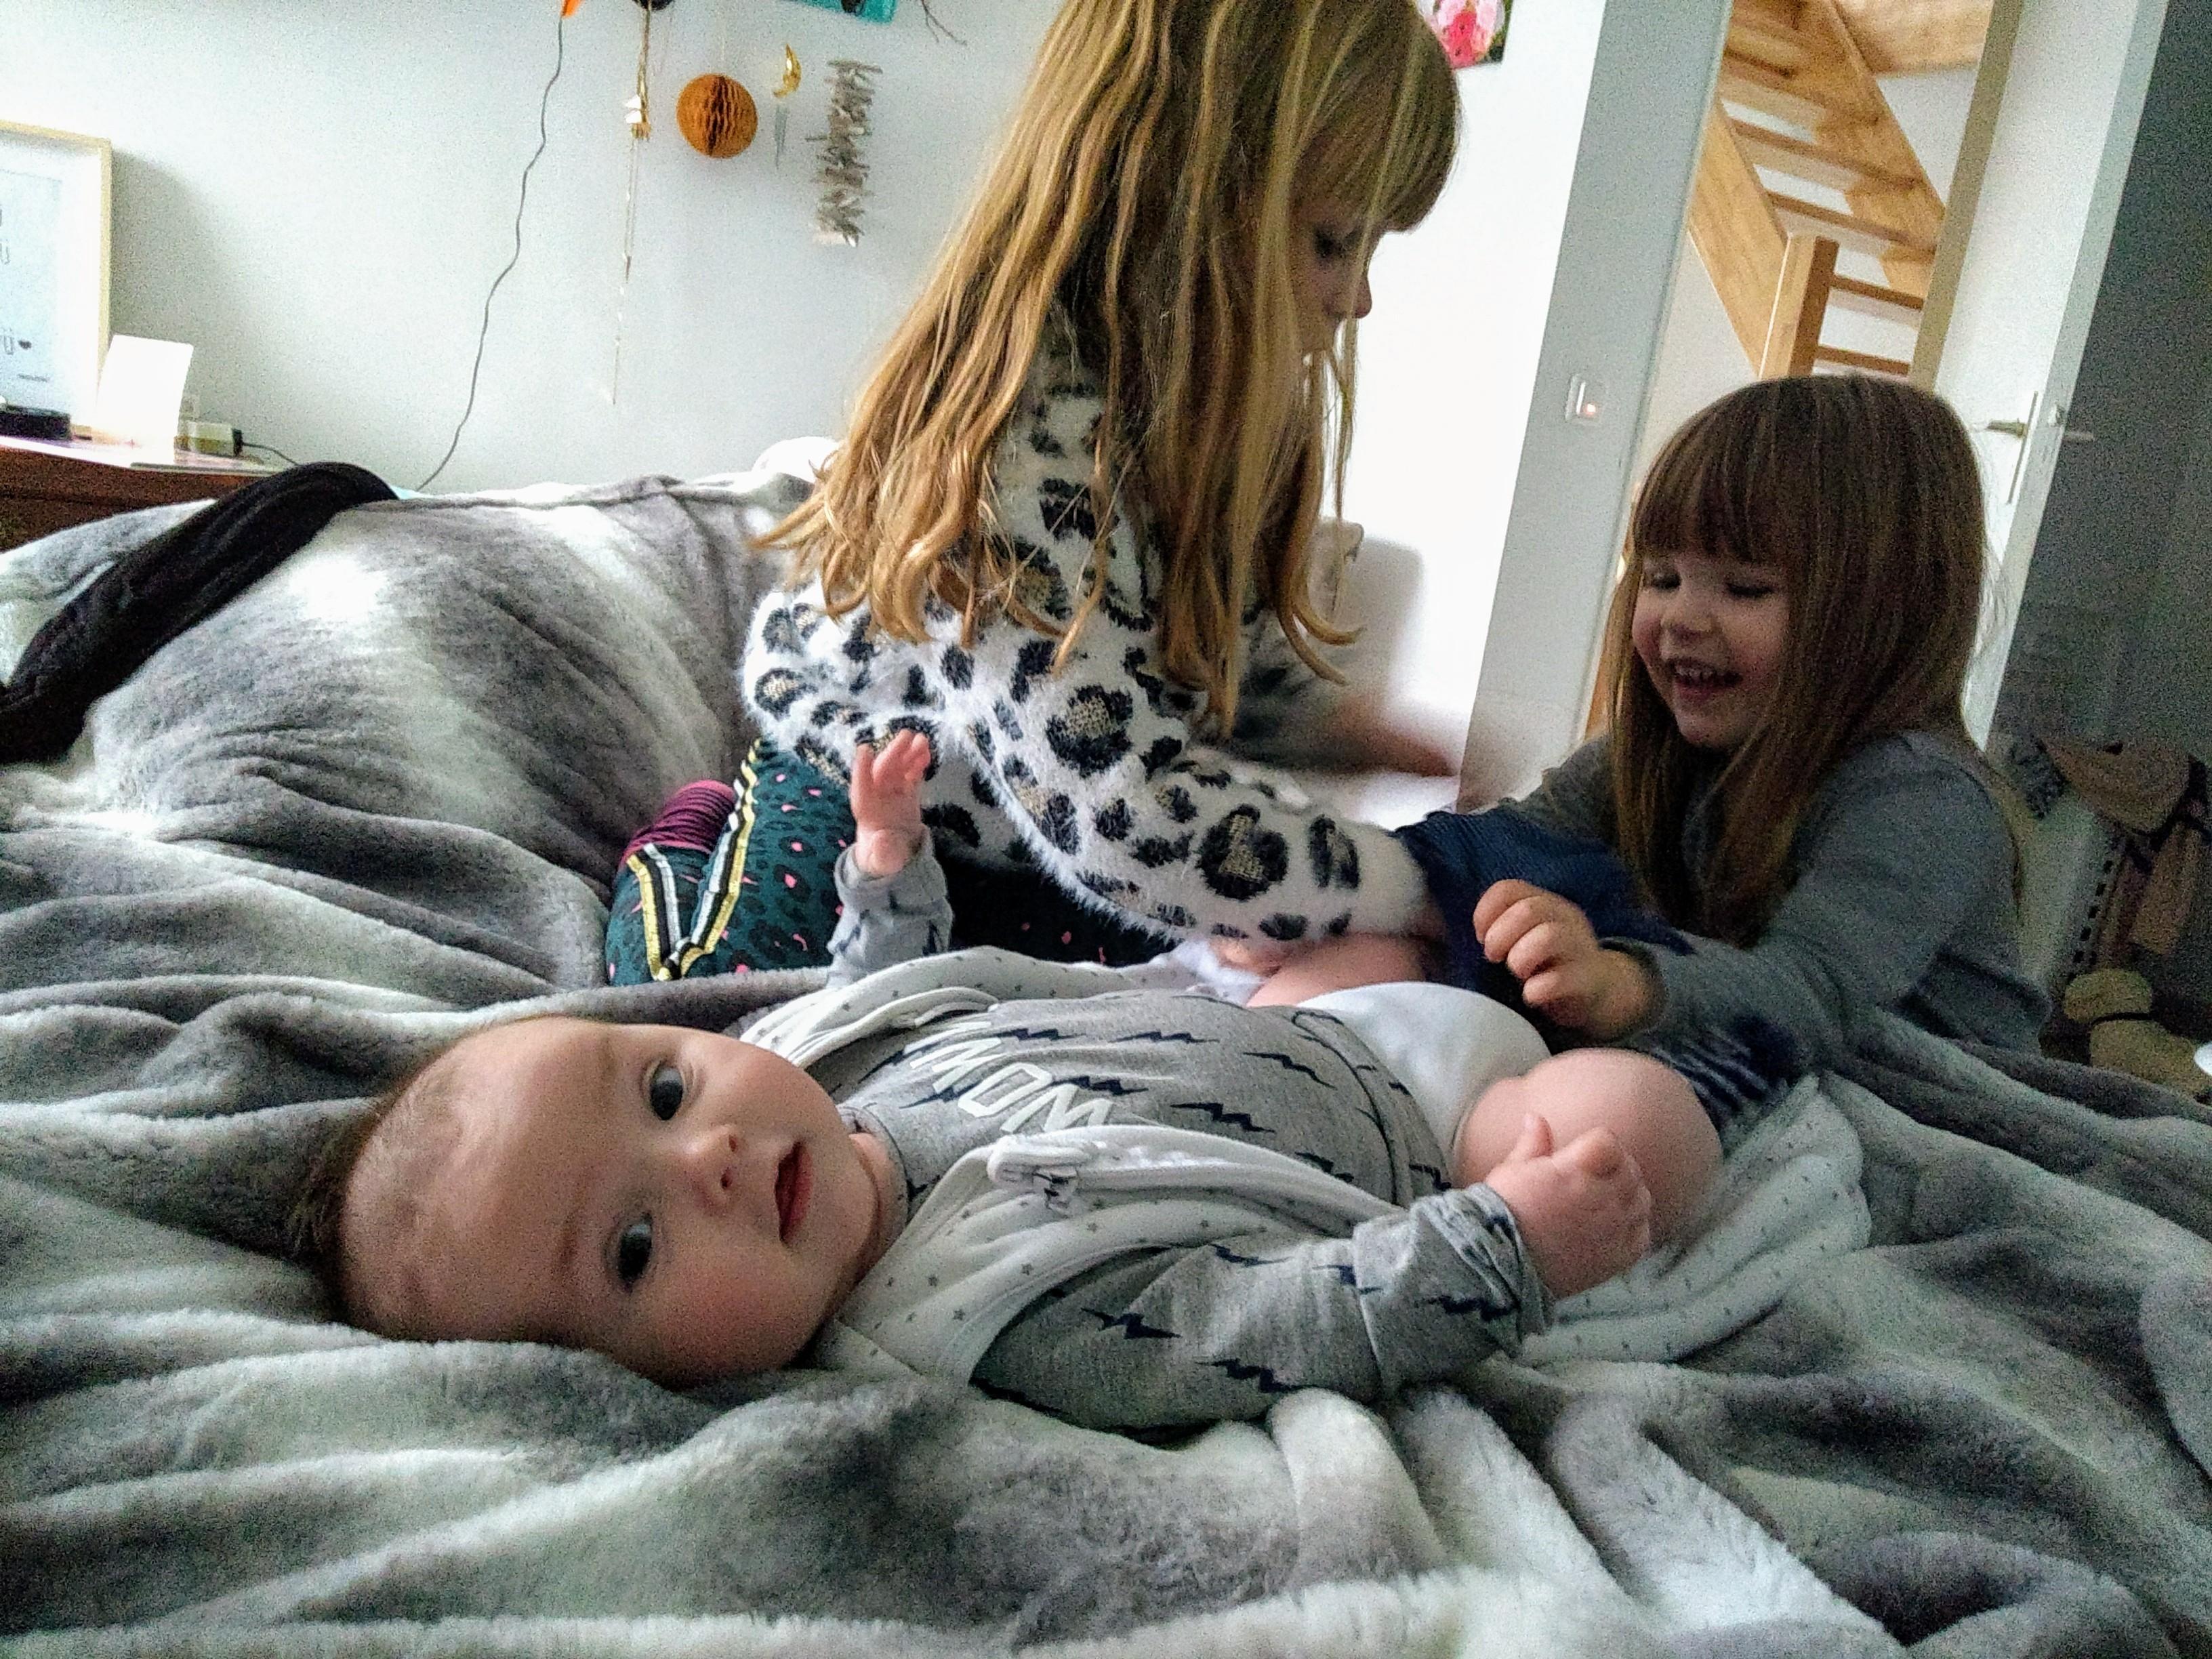 chaos, moederschap, gezin, drie kinderen, momlife, mamalifestyle, mamablog, momblog, gezin van vijf, lalog.nl, lalogblog, lalog